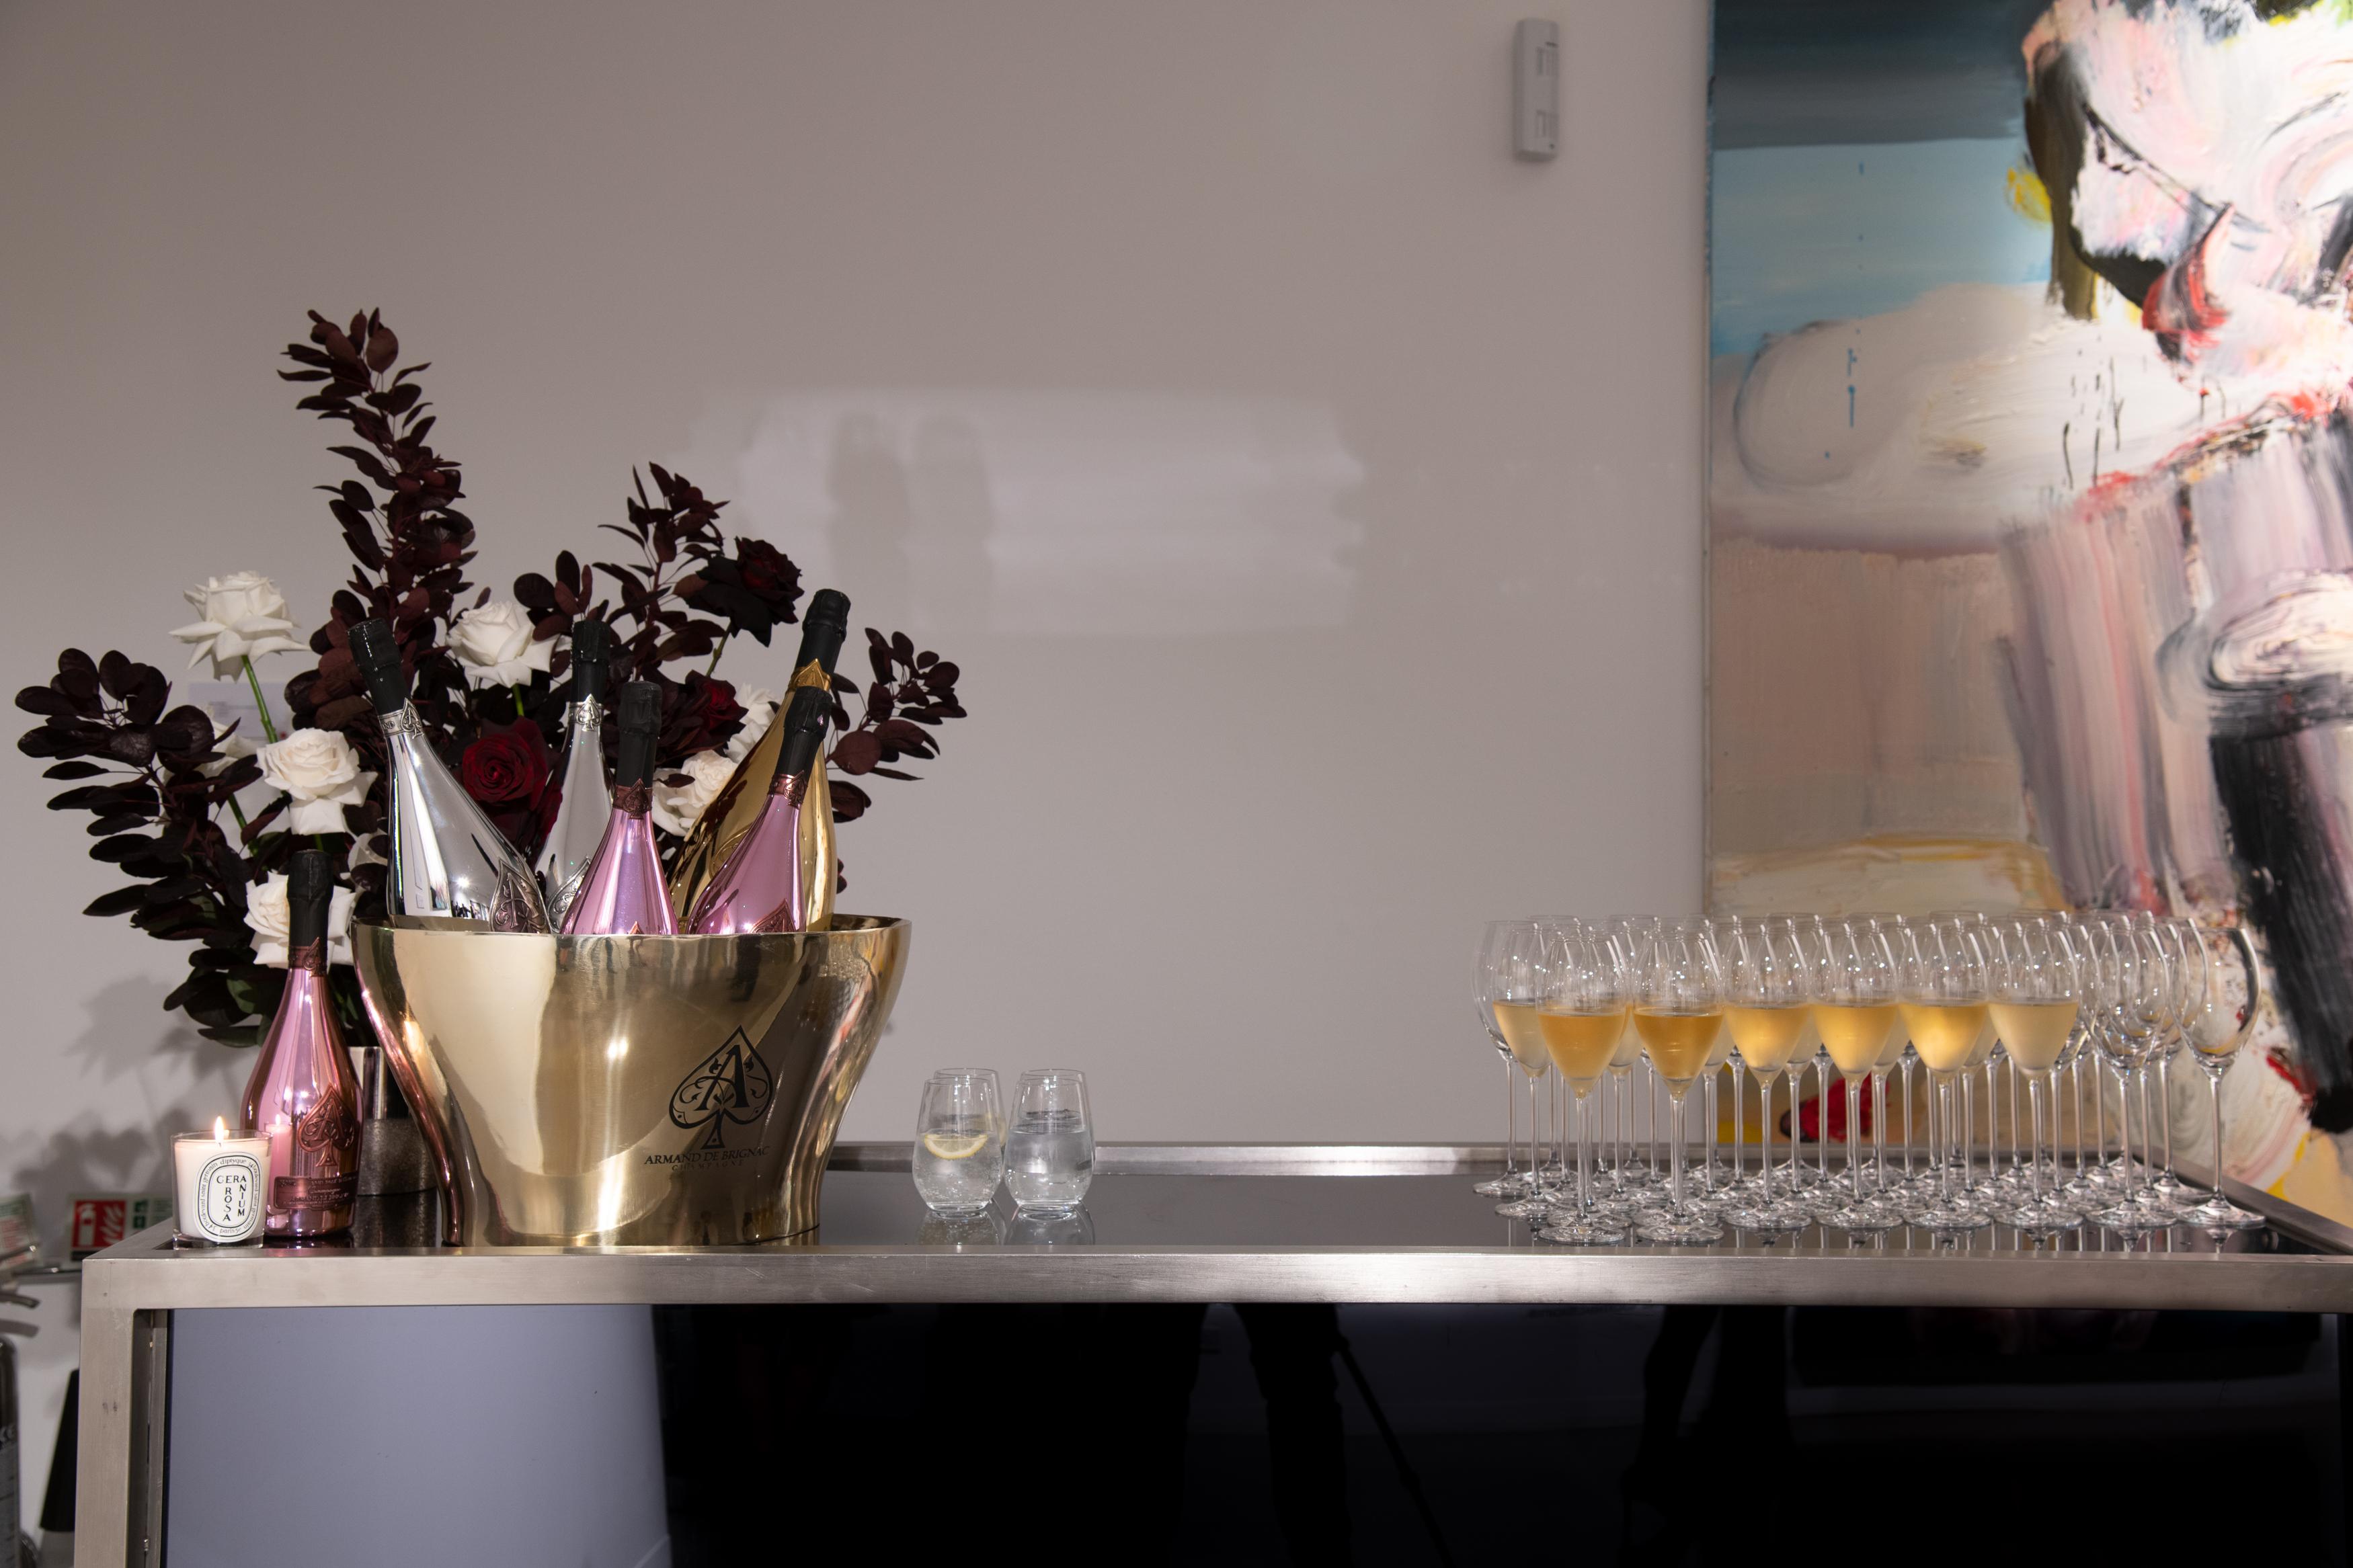 Armand De Brignac Toasts The Art World In London, Hosting A Prestige Champagne Dinner With Jean-David Malat - Armand de Brignac Champagne